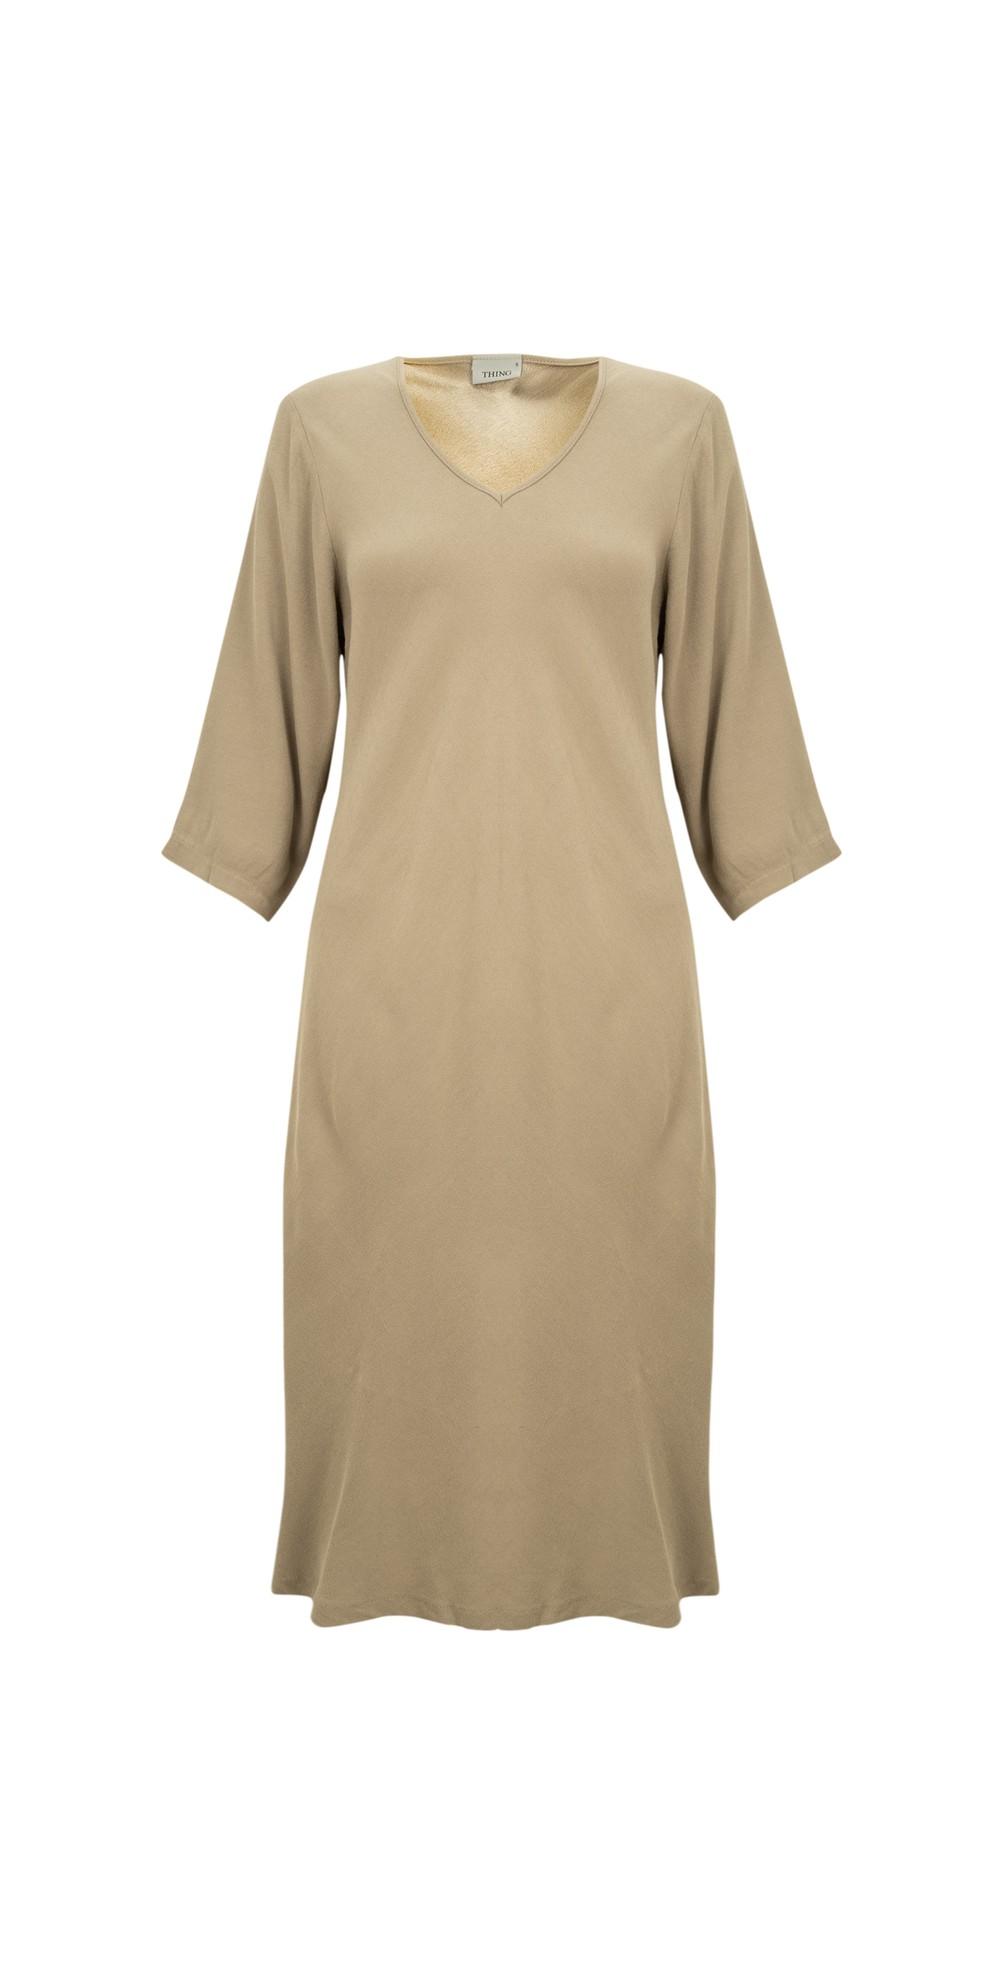 V Neck Fit and Flare Crepe Dress main image